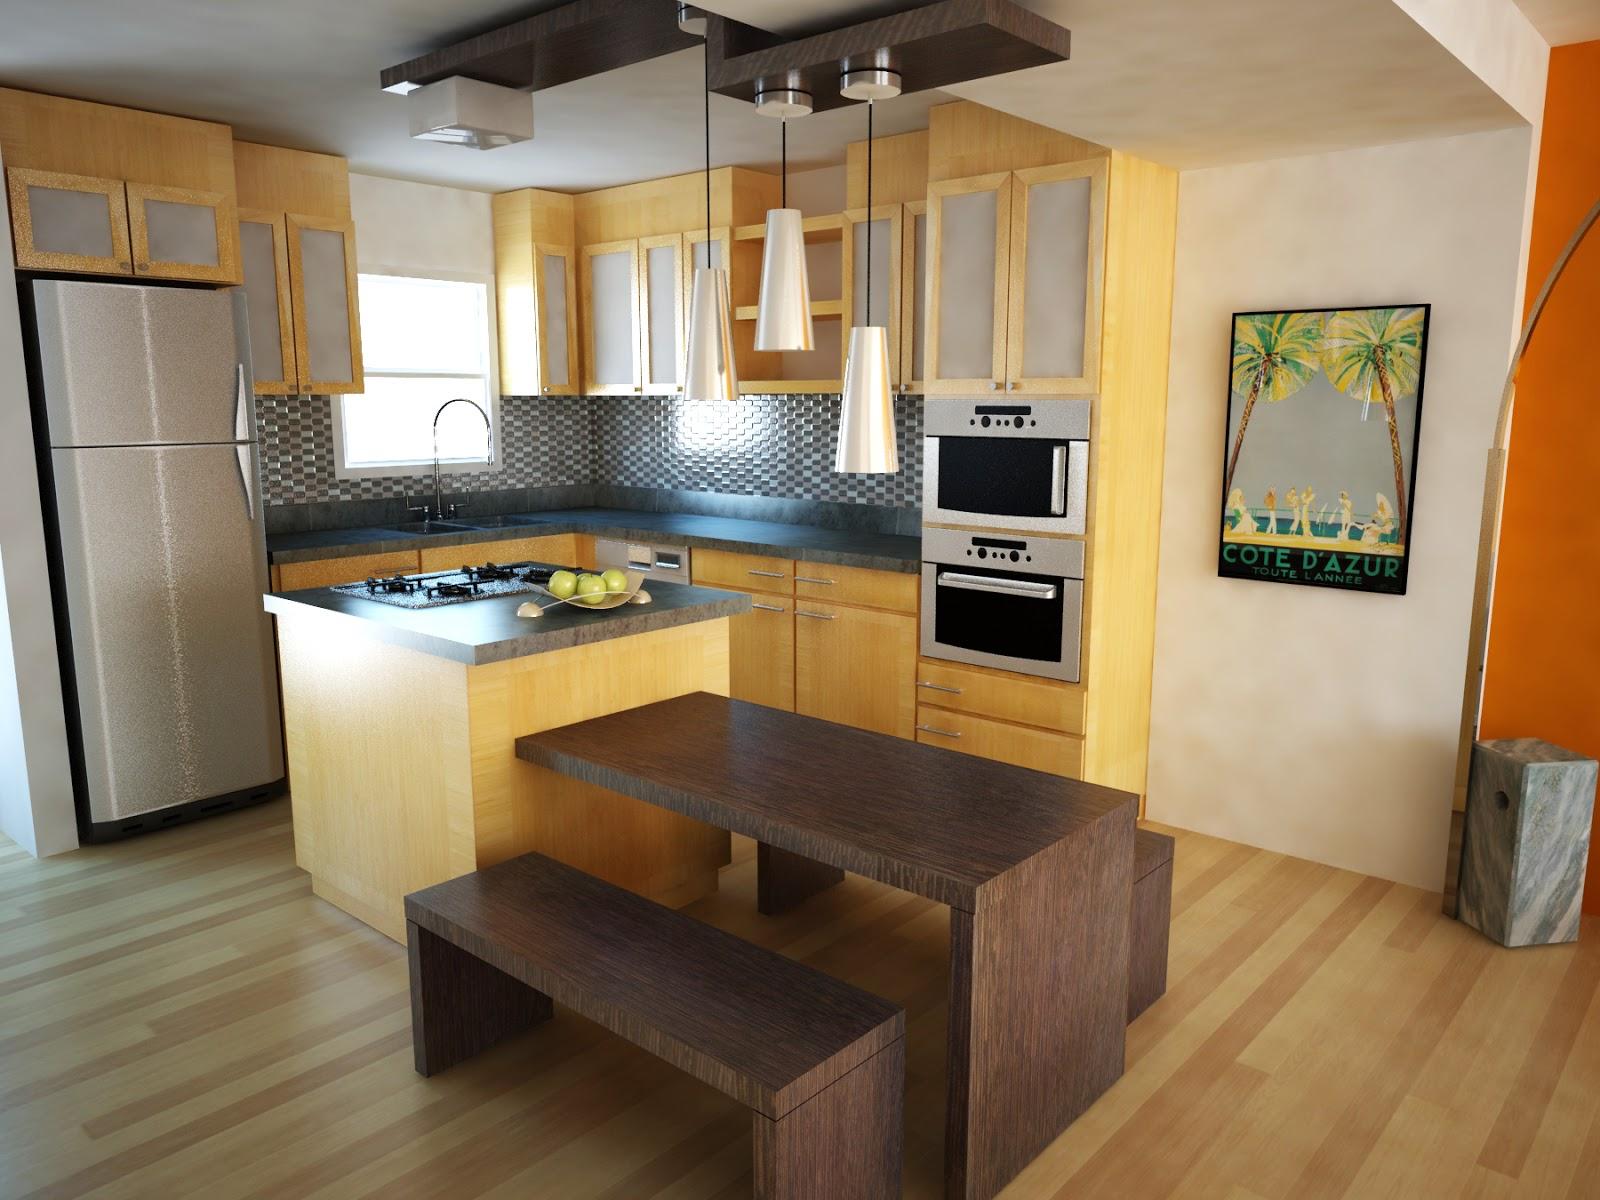 Small Kitchen Design Plans Interior 2014